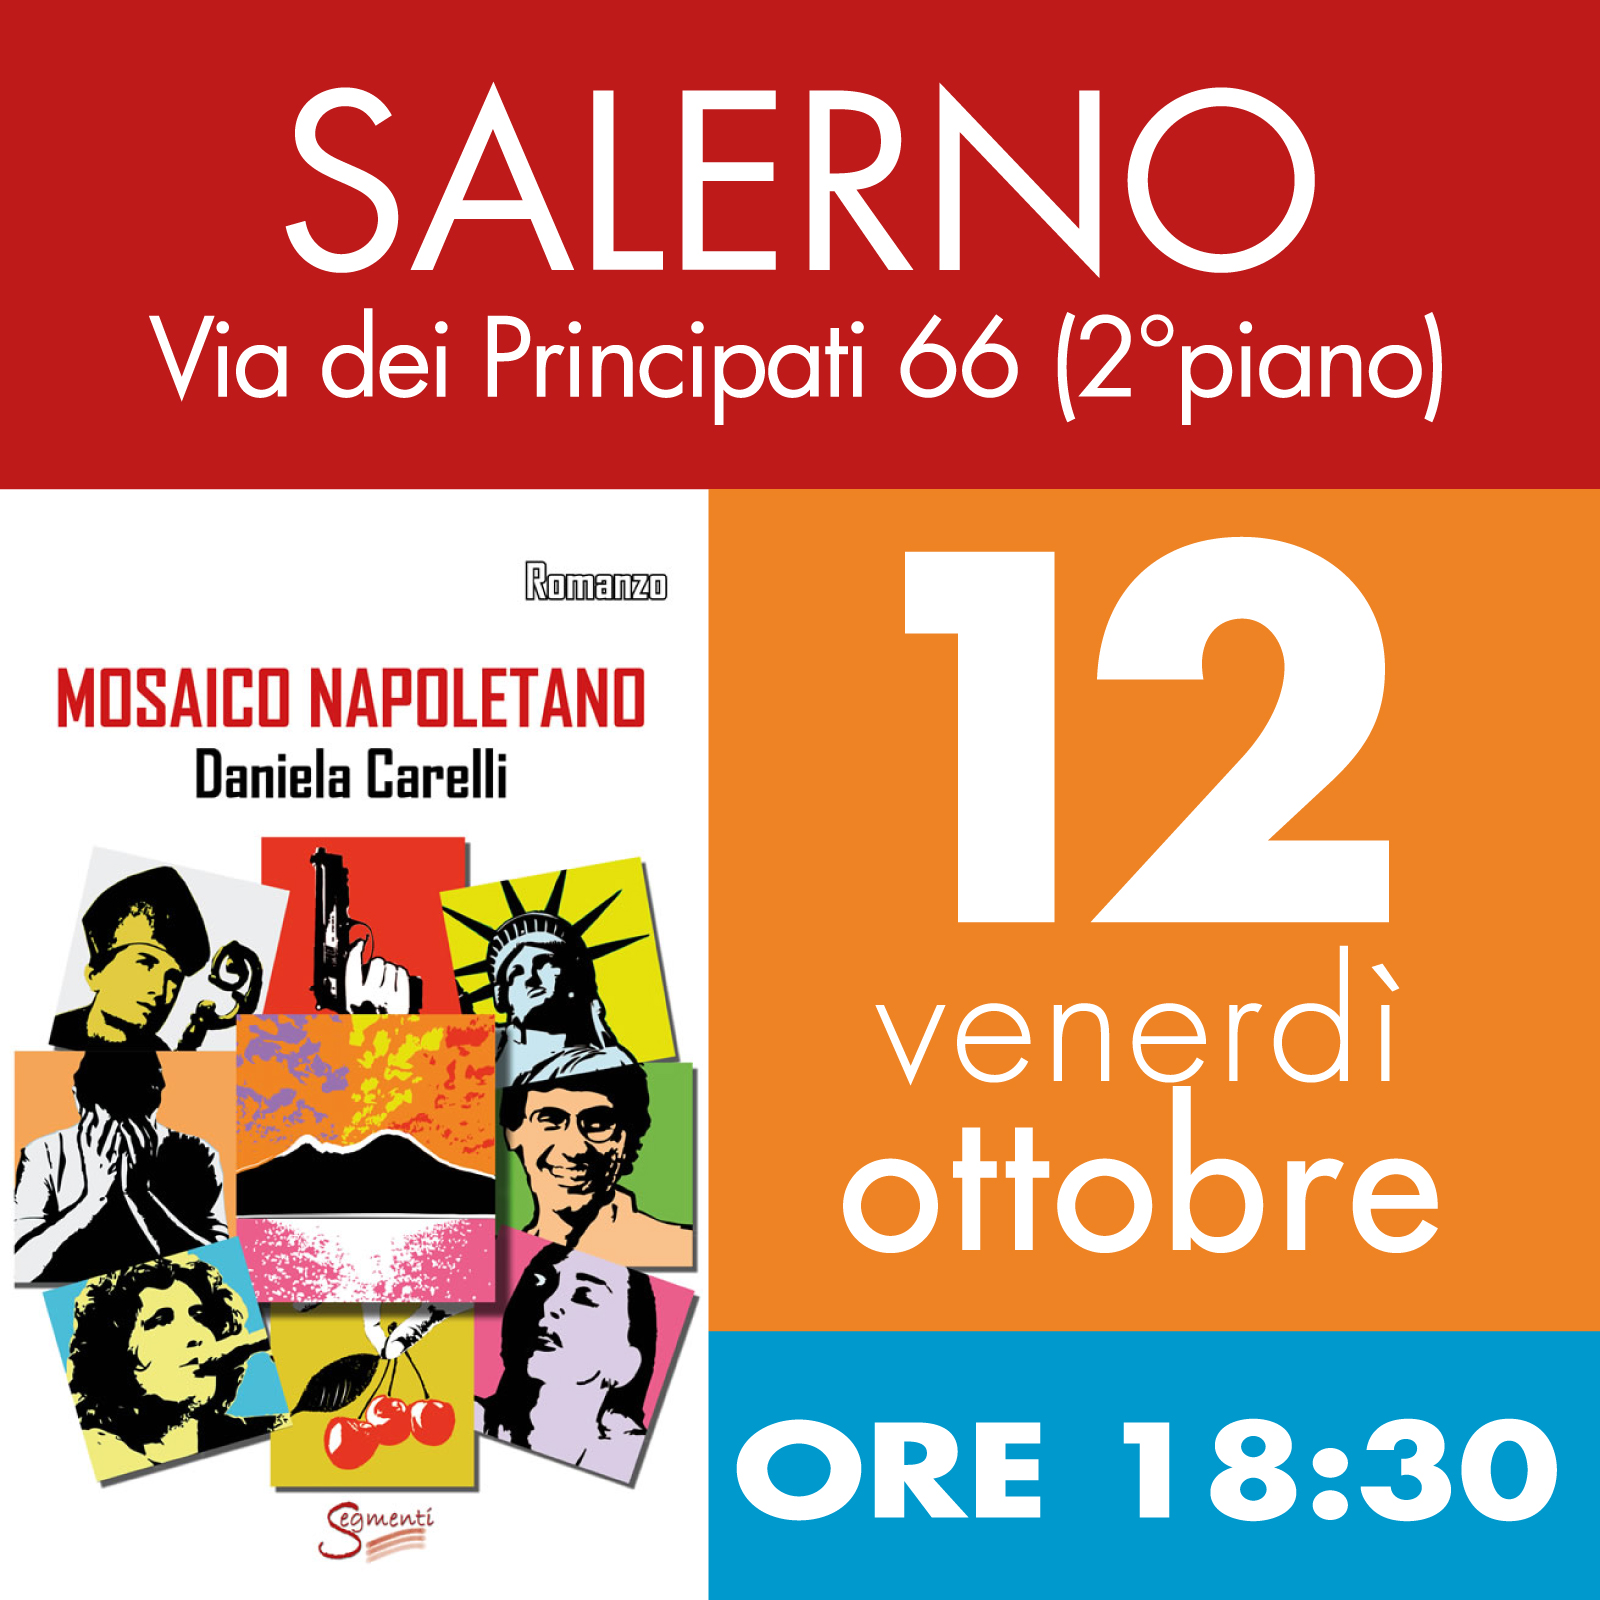 Incontro a Salerno